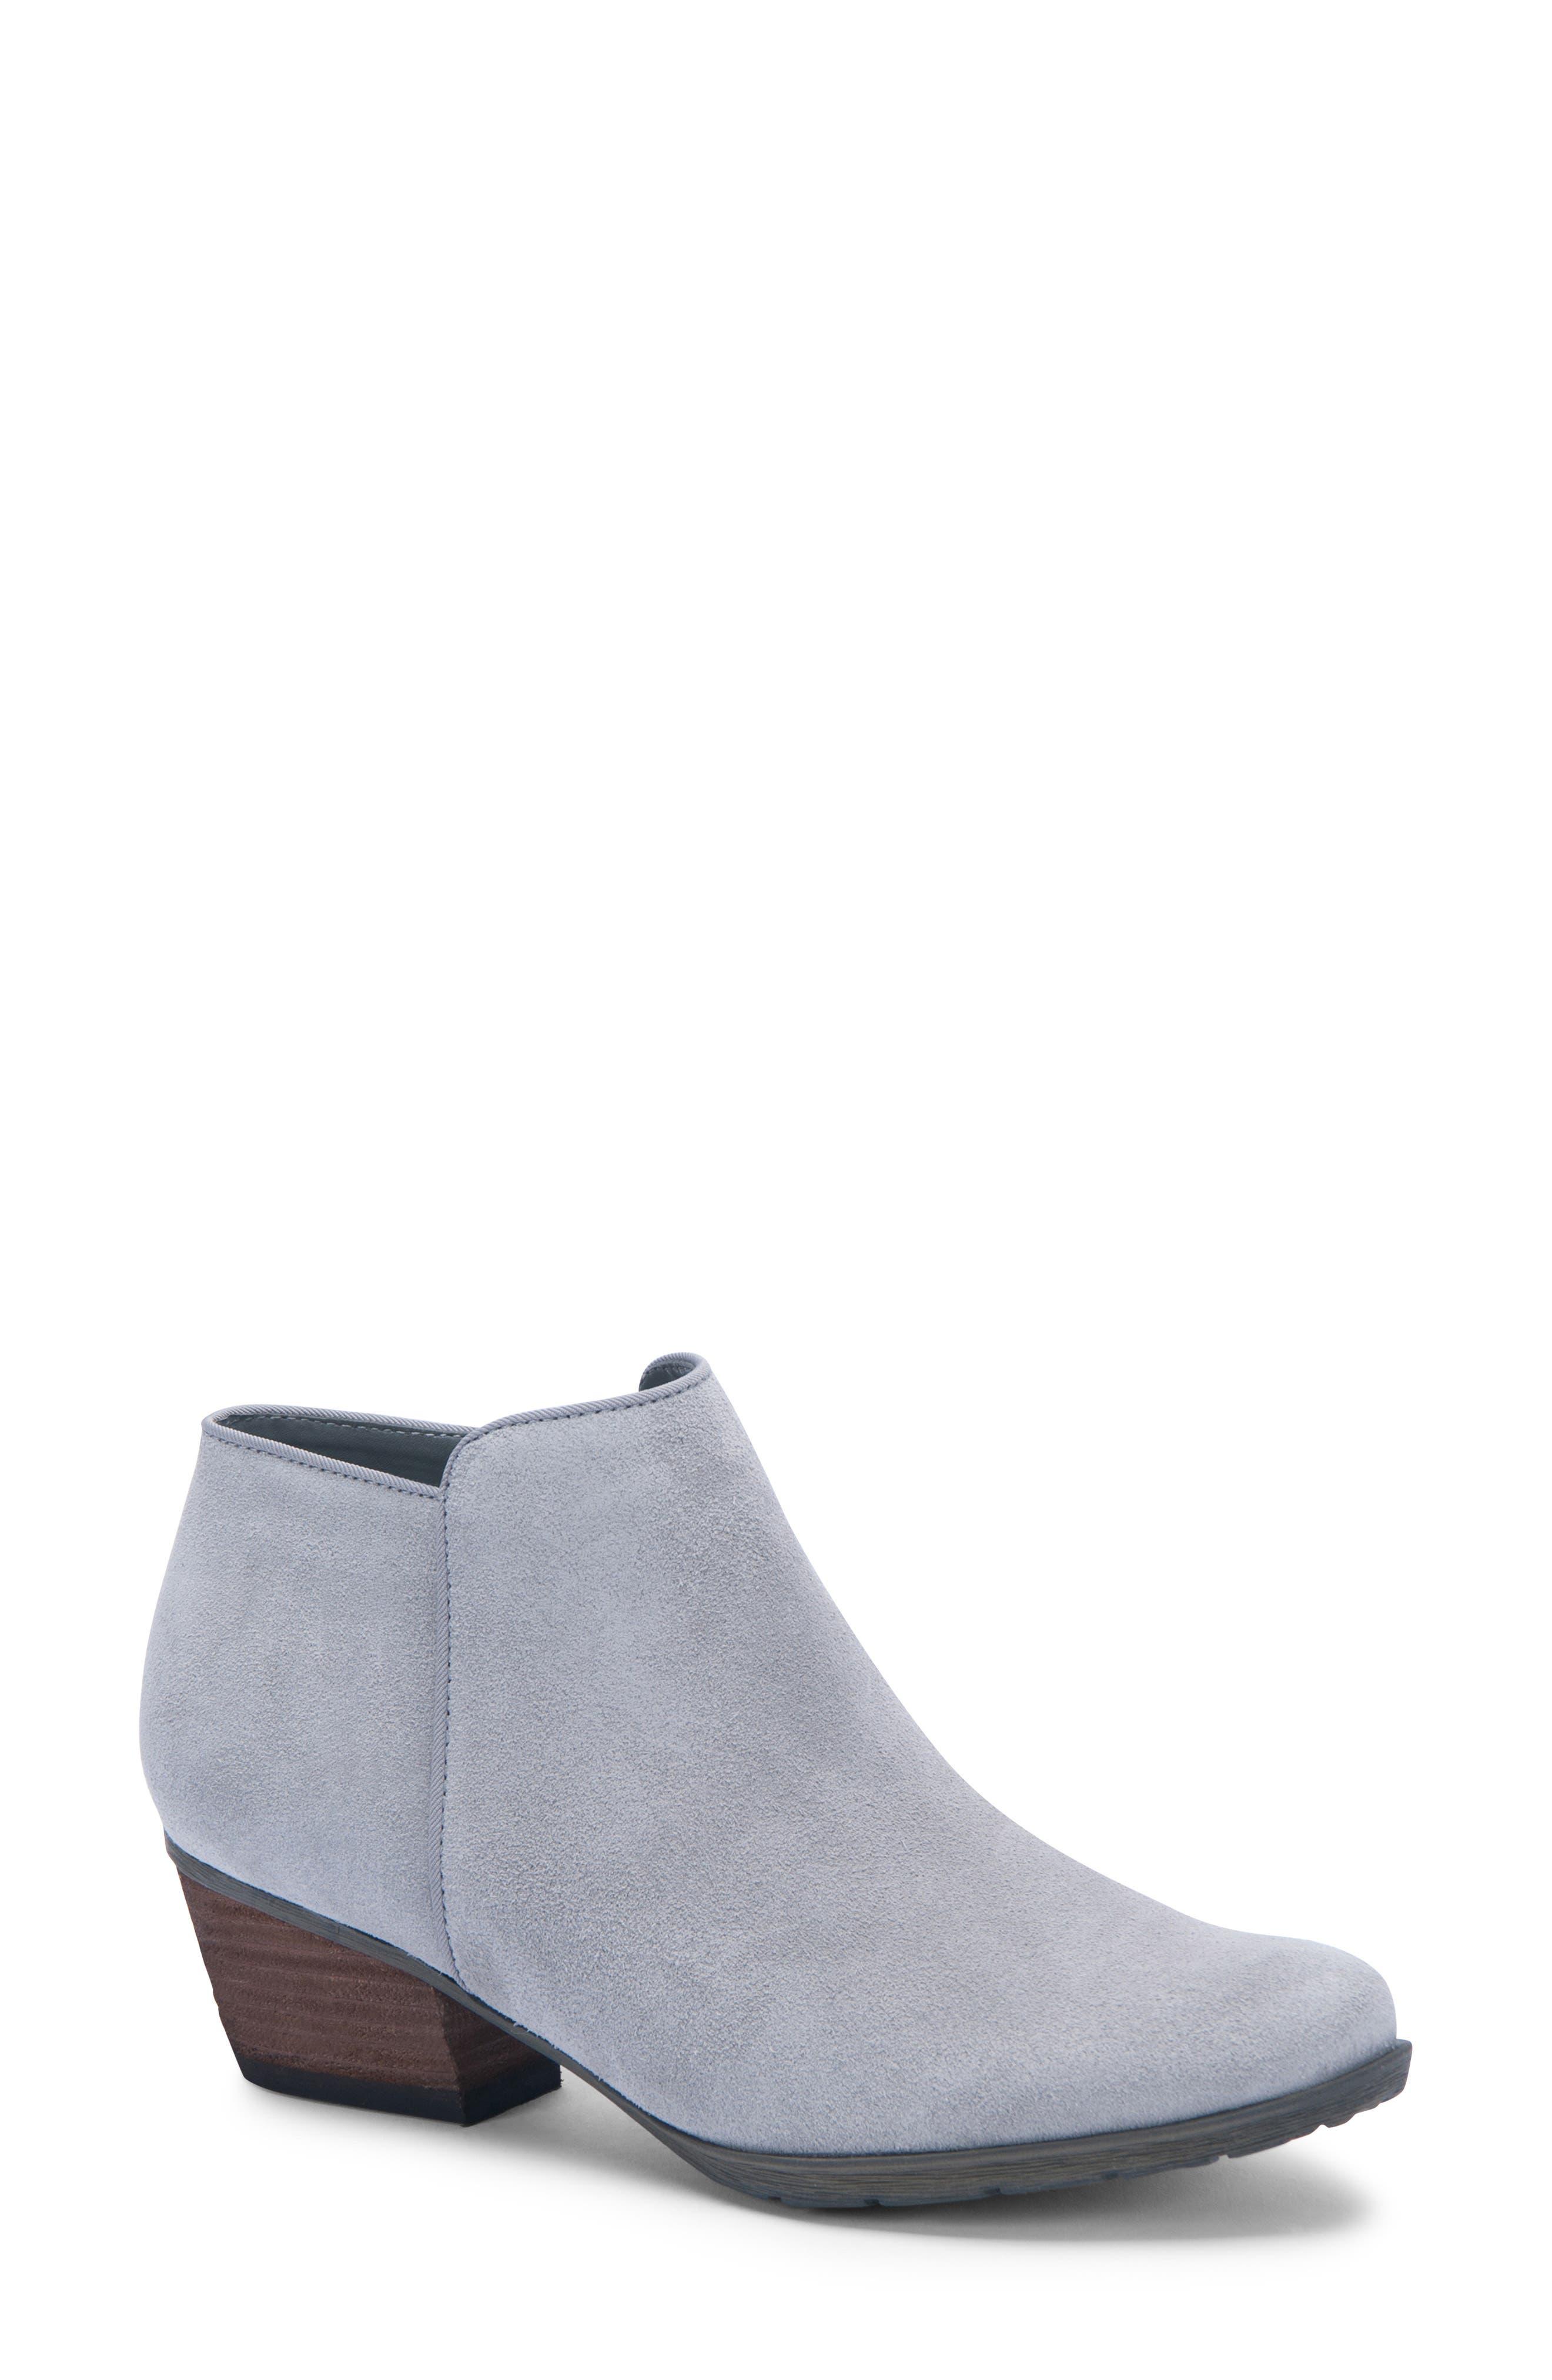 Blondo Villa Waterproof Boot, Grey